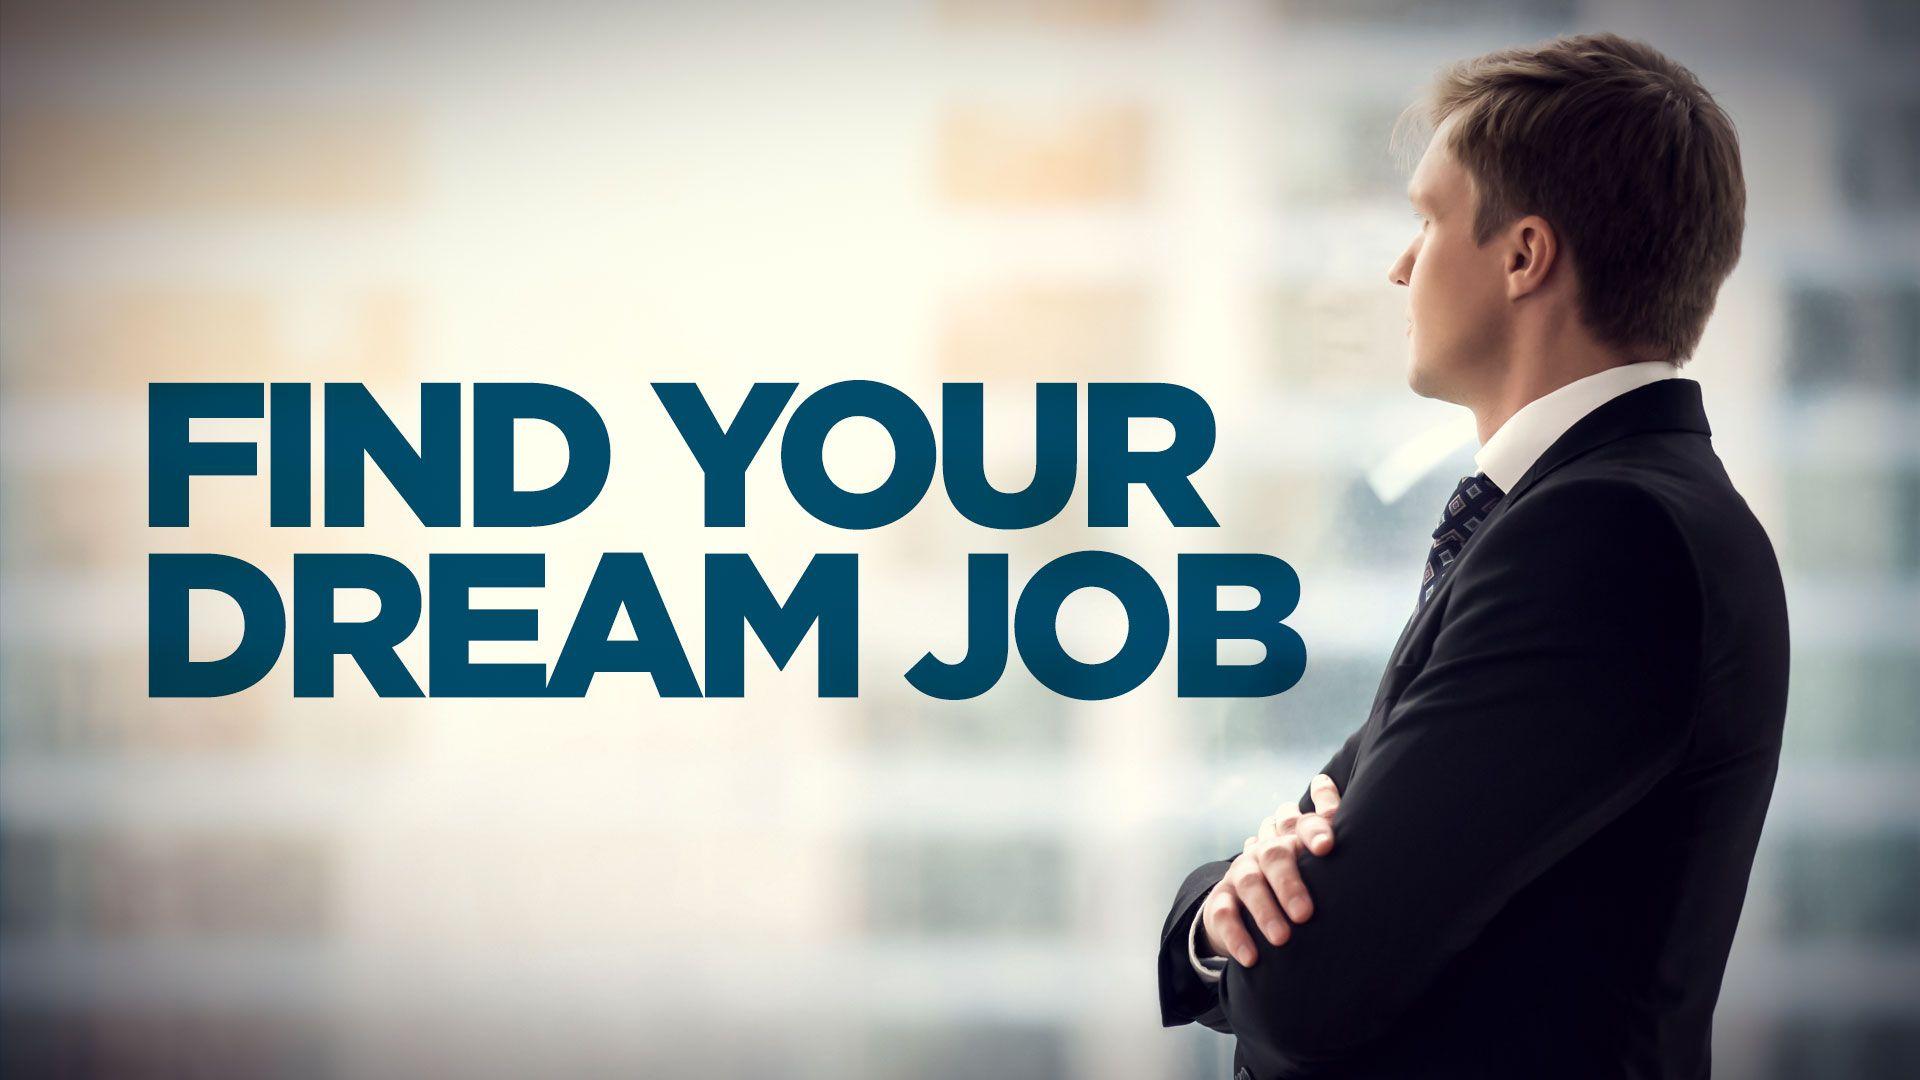 Find your dream job   Find a job, Job portal, Finding the right job